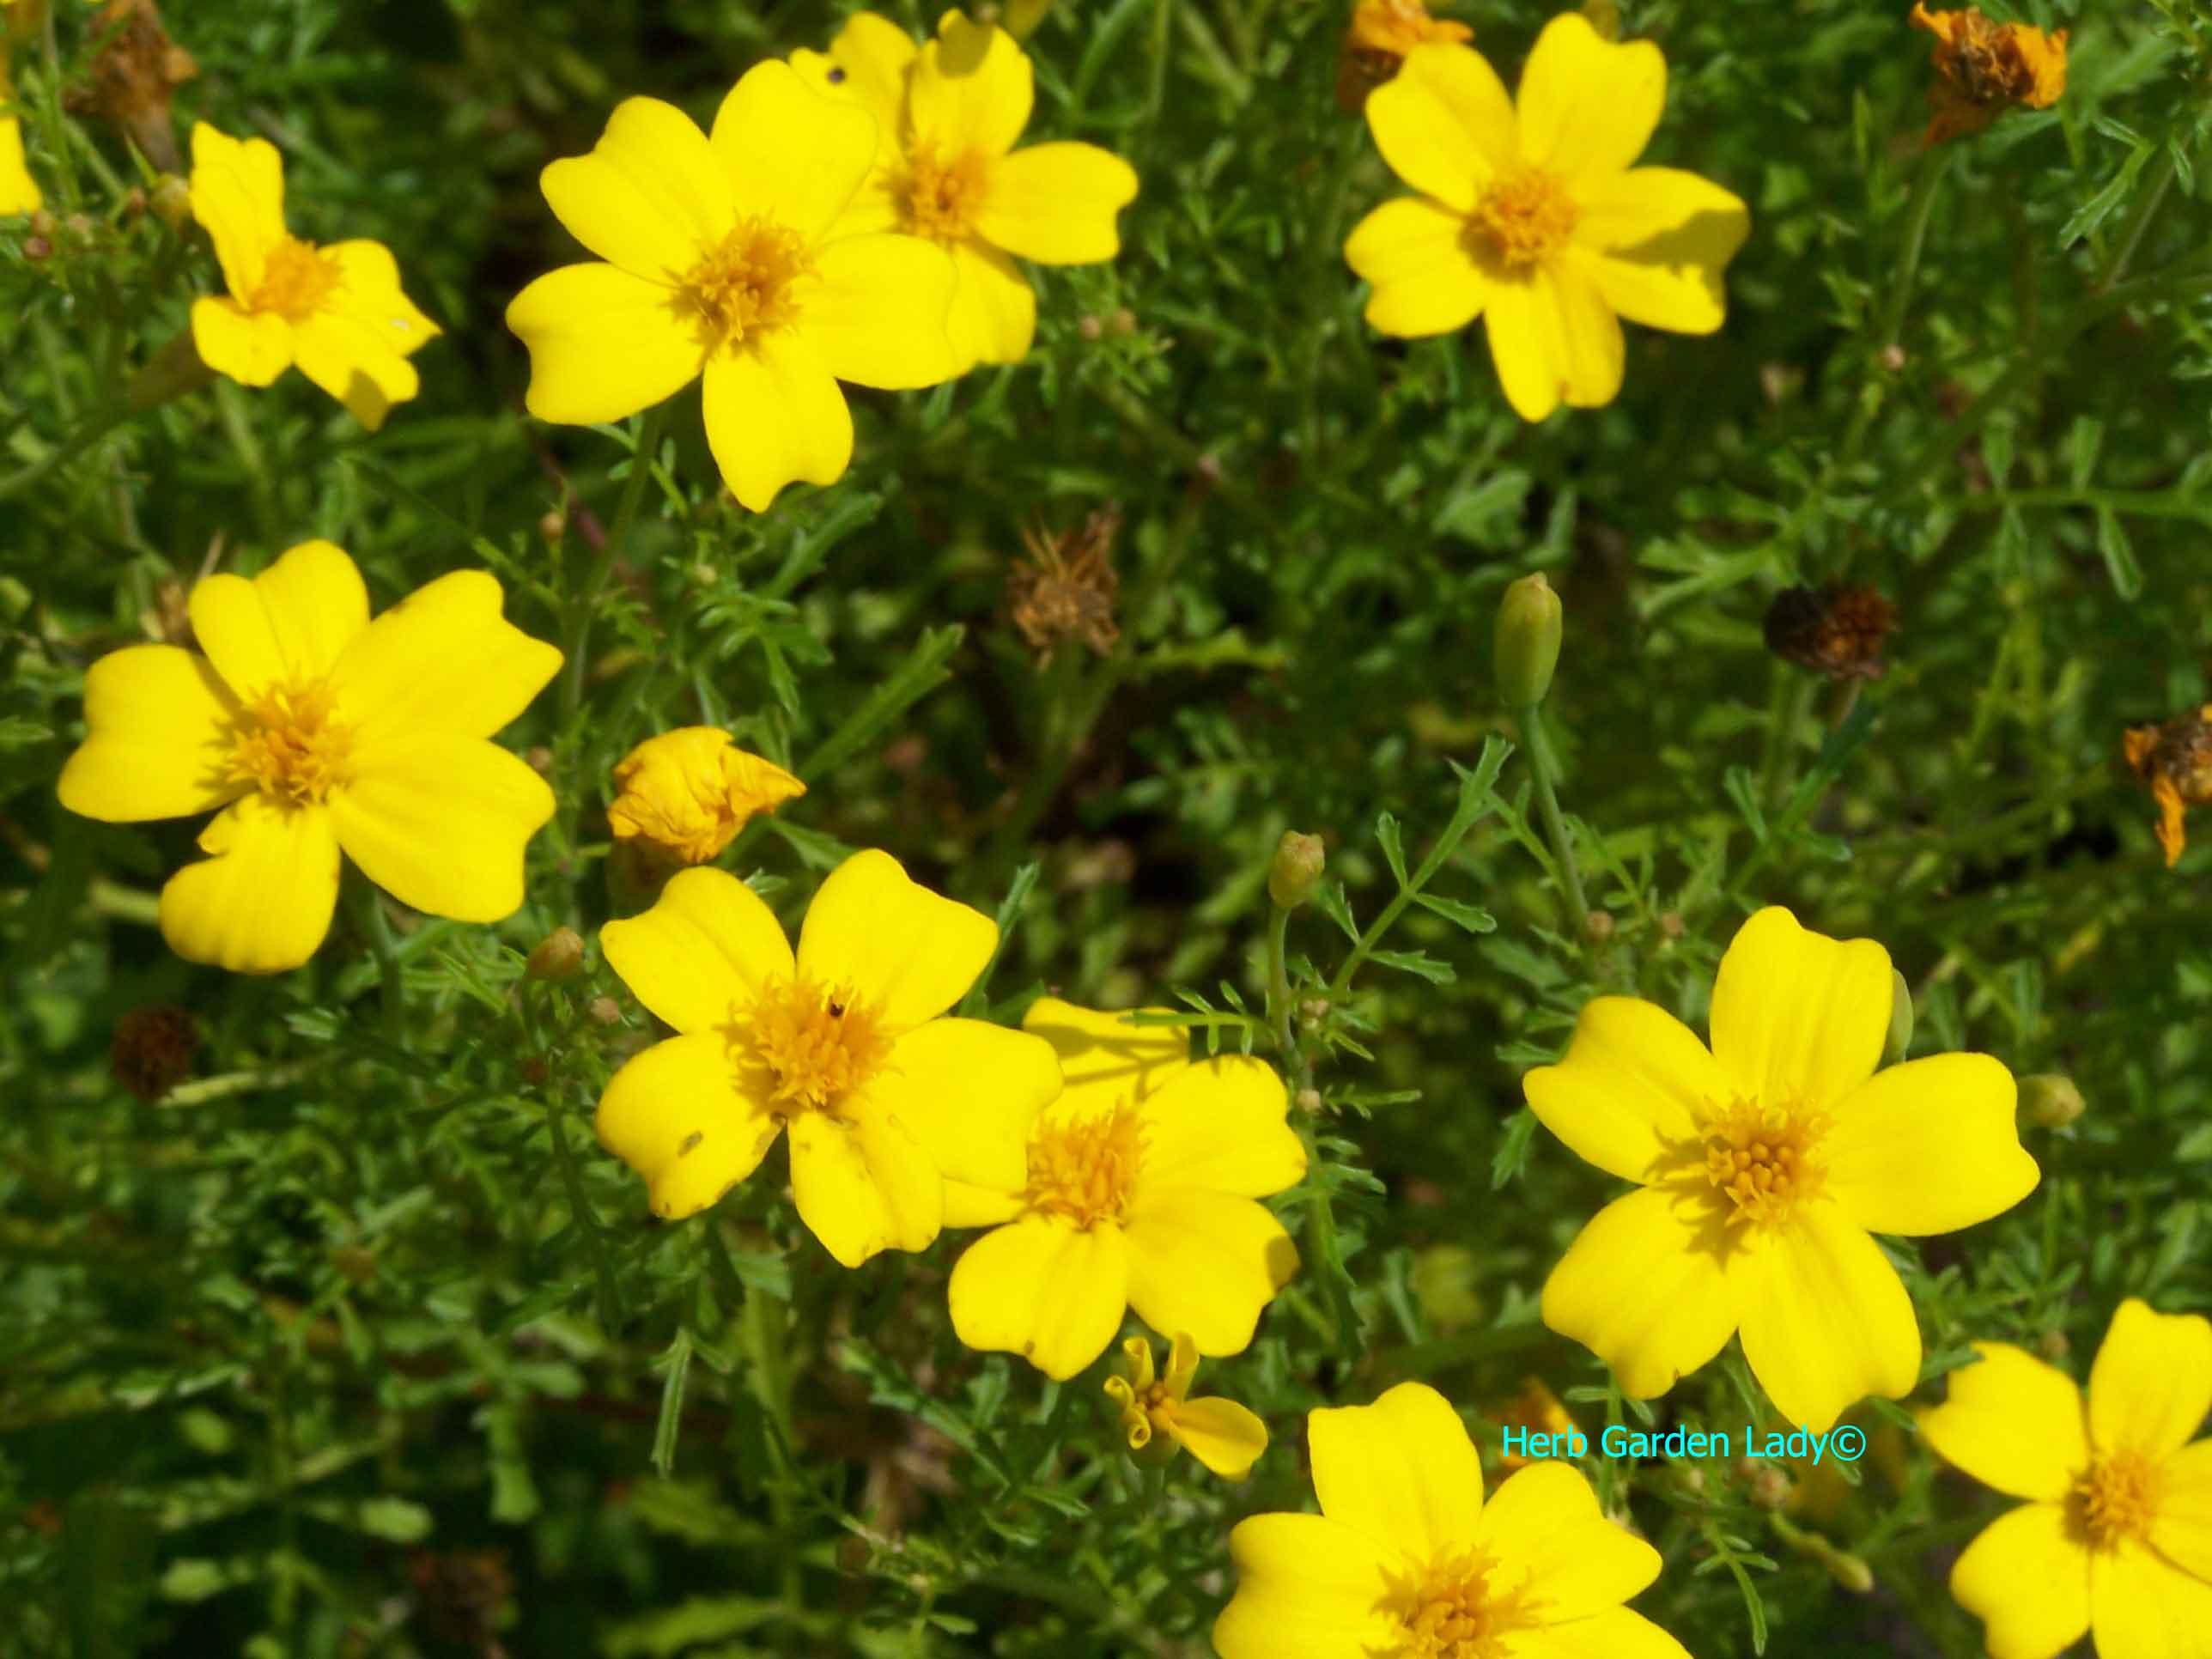 Lemon Gem (Tagetes tenuifolia) marigolds are edible flowers.